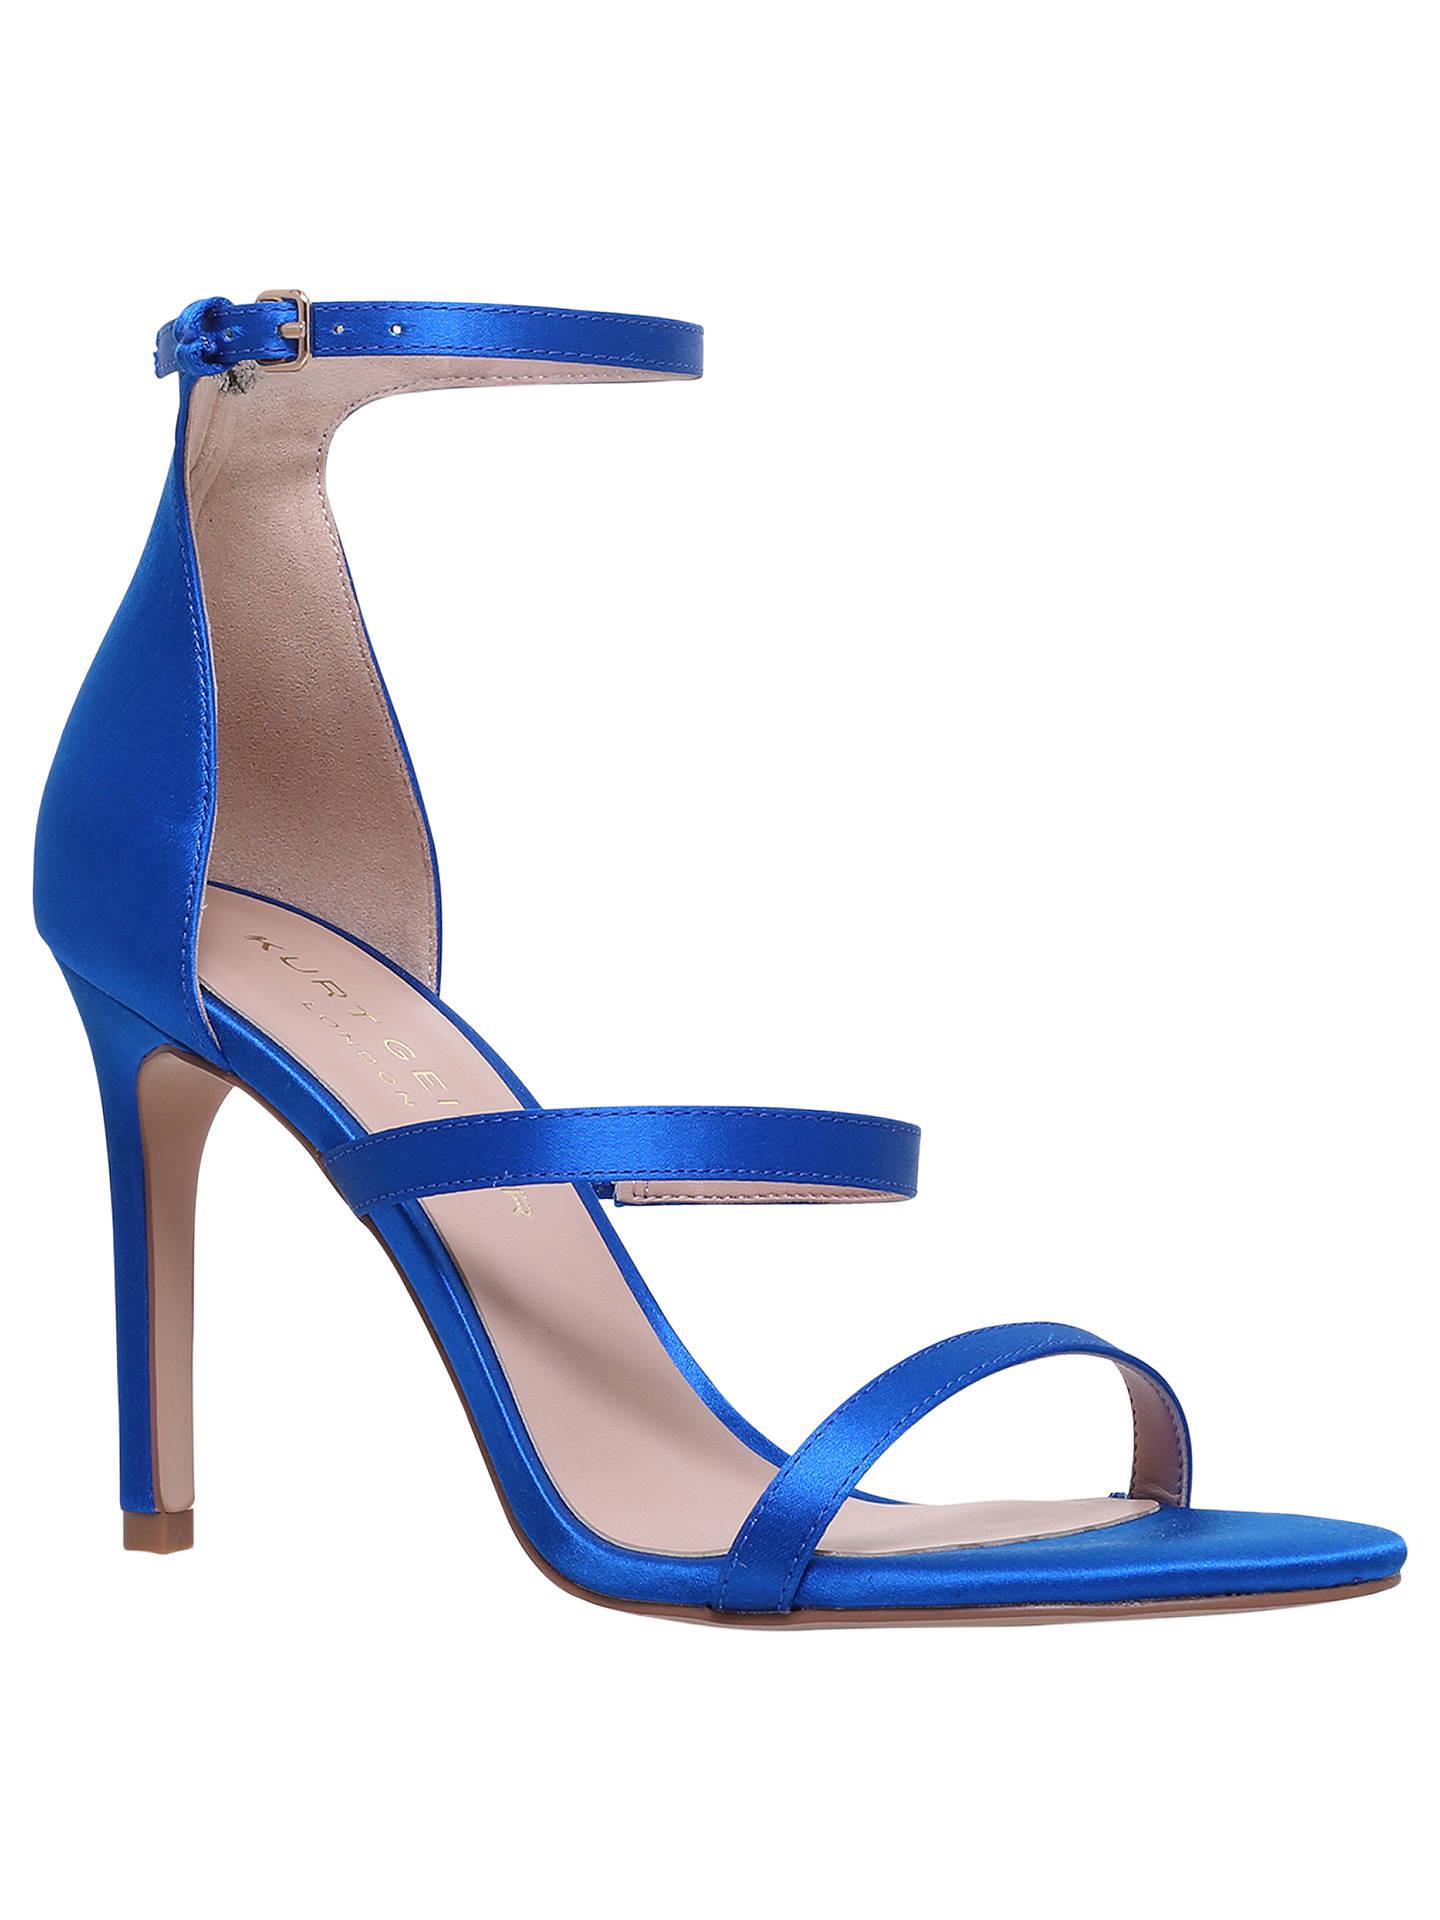 d34a0a17429c5 Buy Kurt Geiger London Park Lane Stiletto Heel Sandals